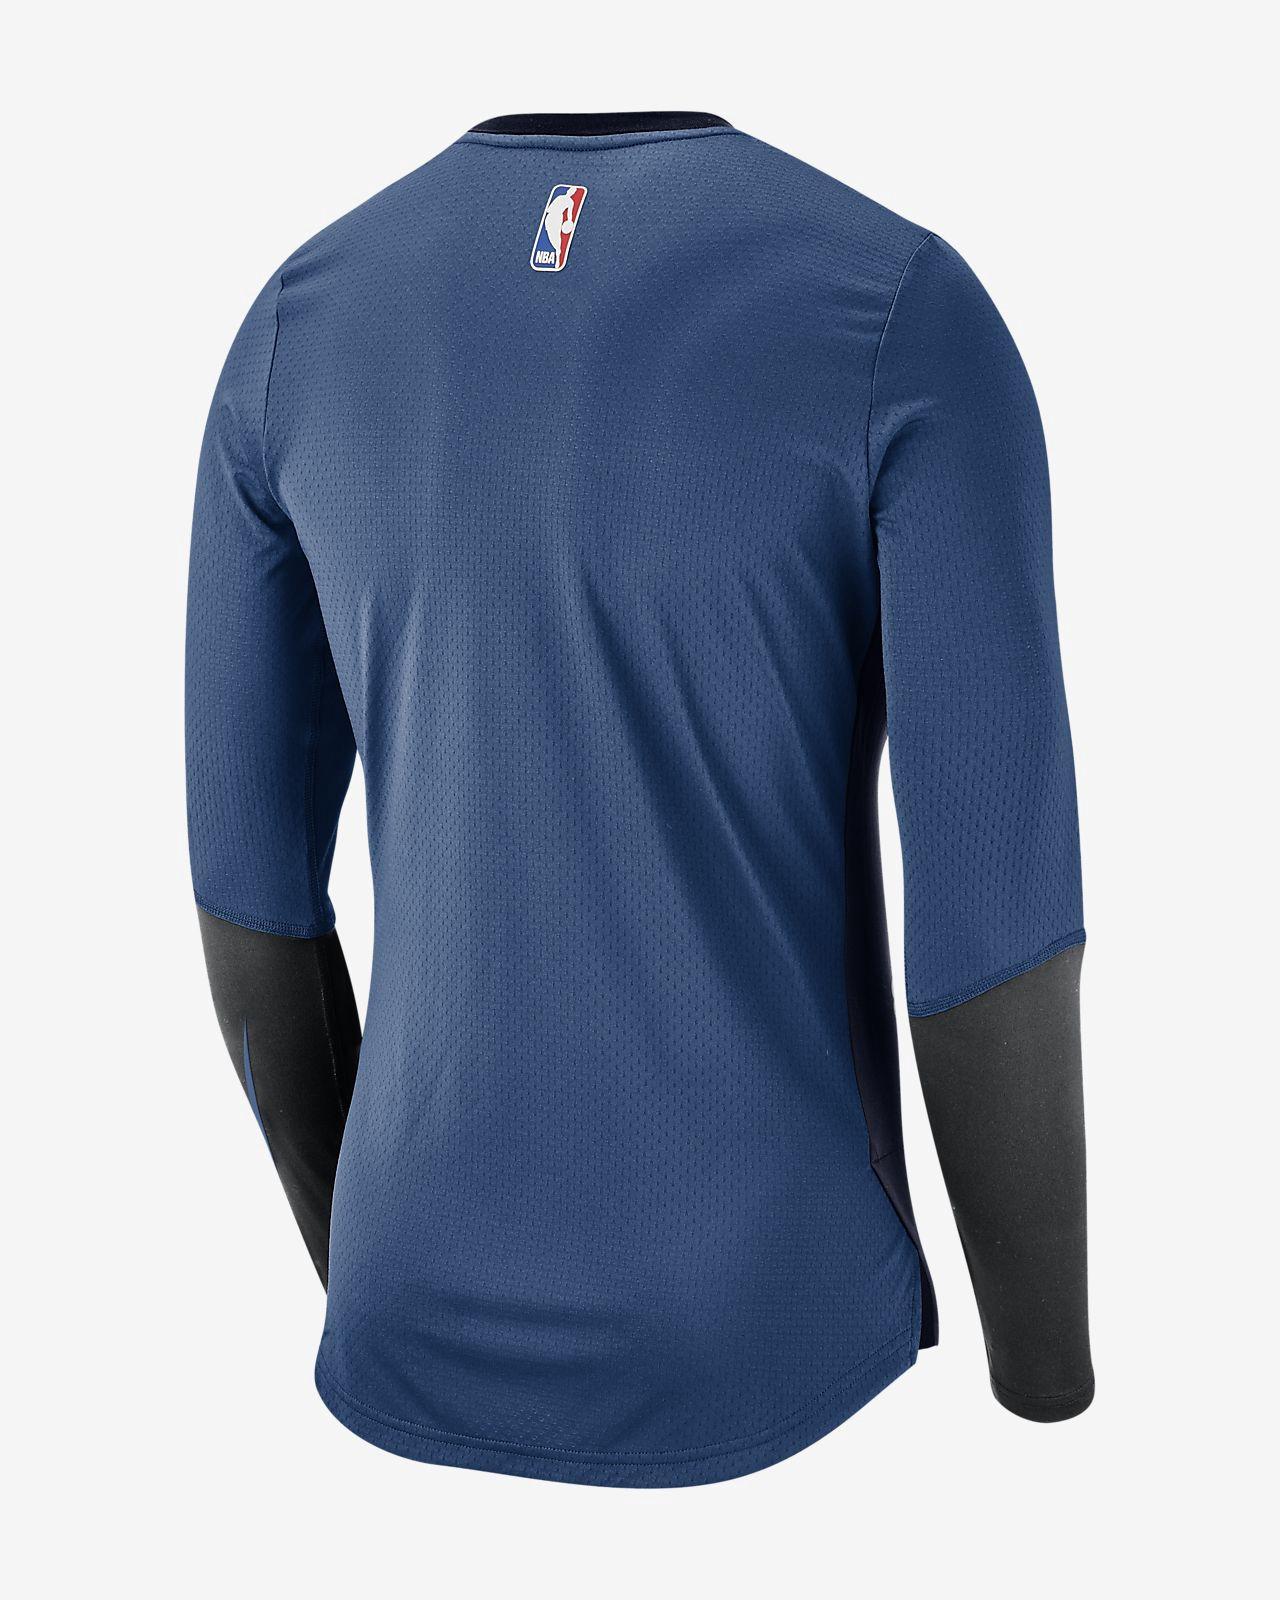 Nike Minnesota Timberwolves Dri-Fit Men s Long-Sleeve Nba Top - 2XL ... f5672b276